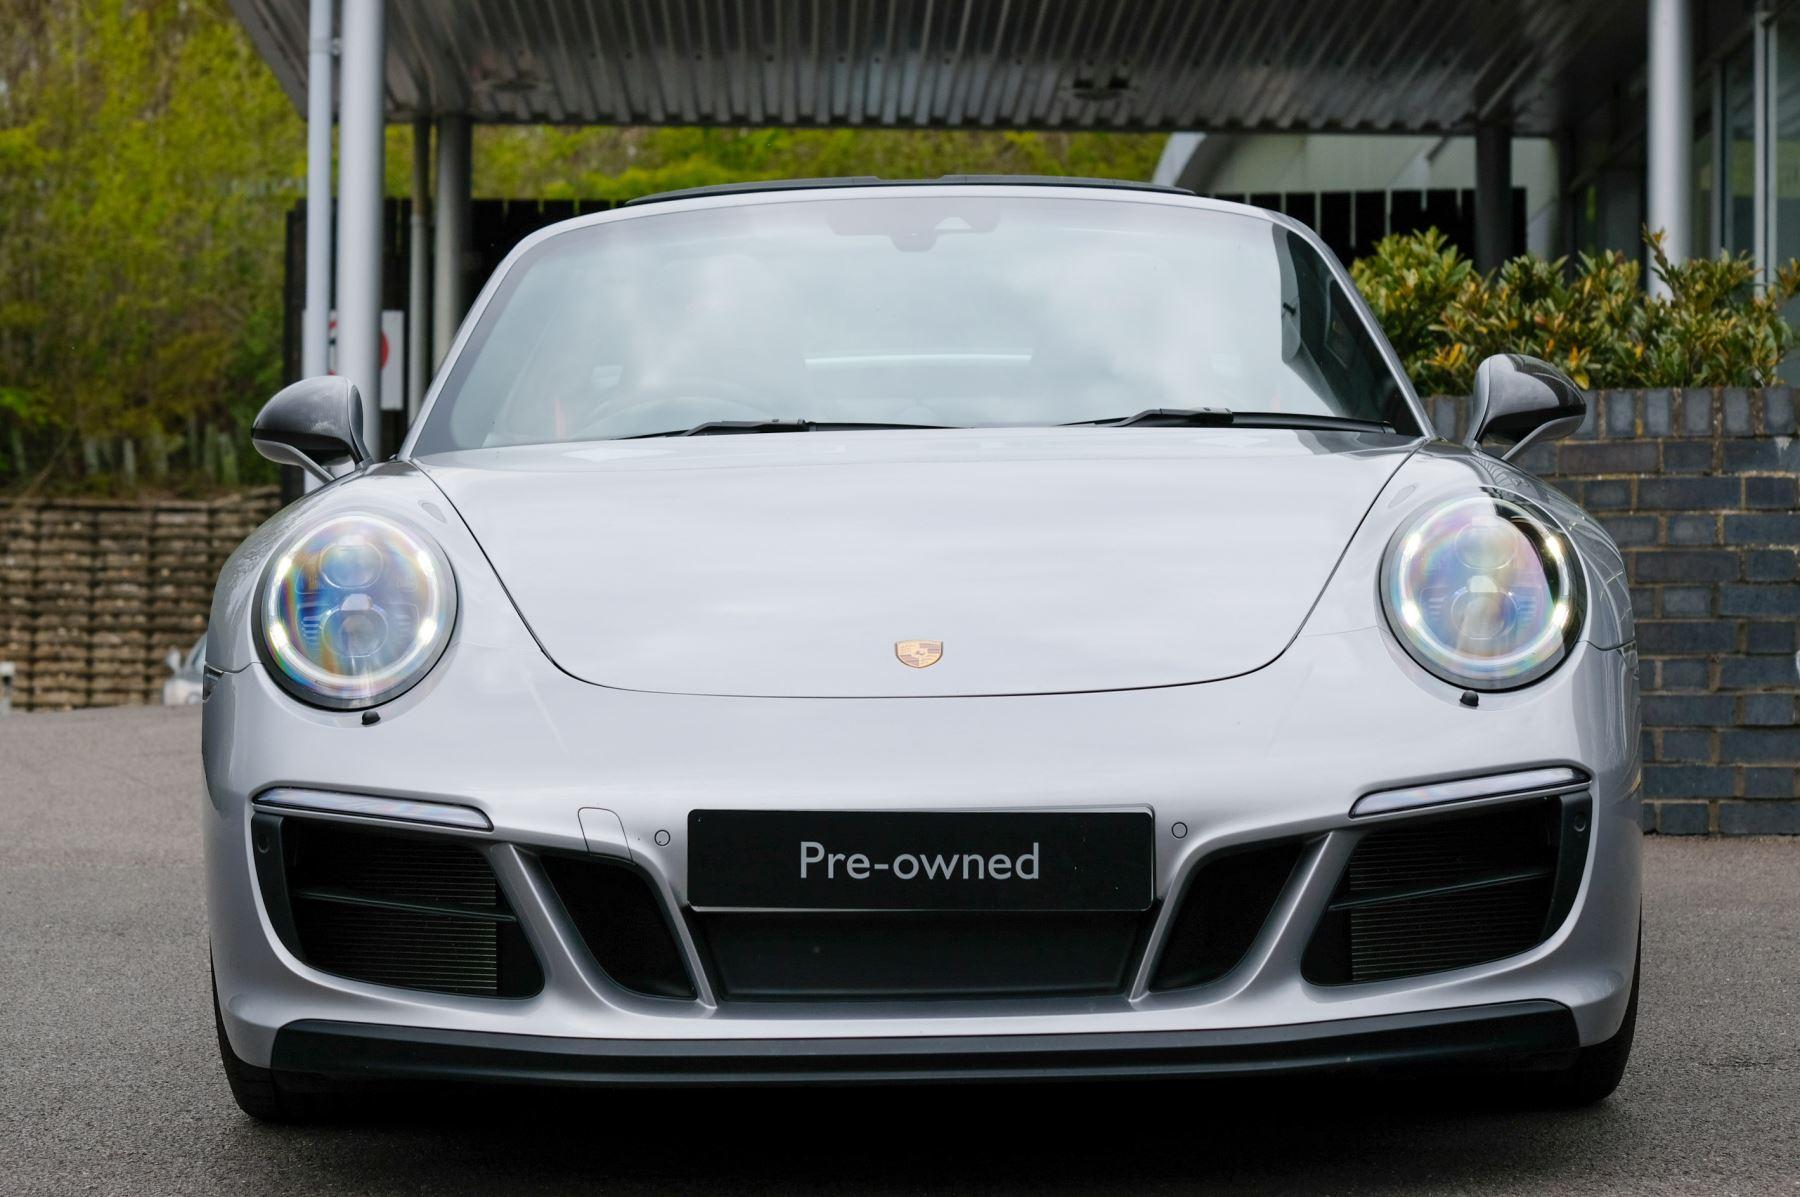 Porsche 911 TARGA 4 GTS - PDK - SPORT DESIGN PACKAGE - GTS INTERIOR PACKAGE image 4